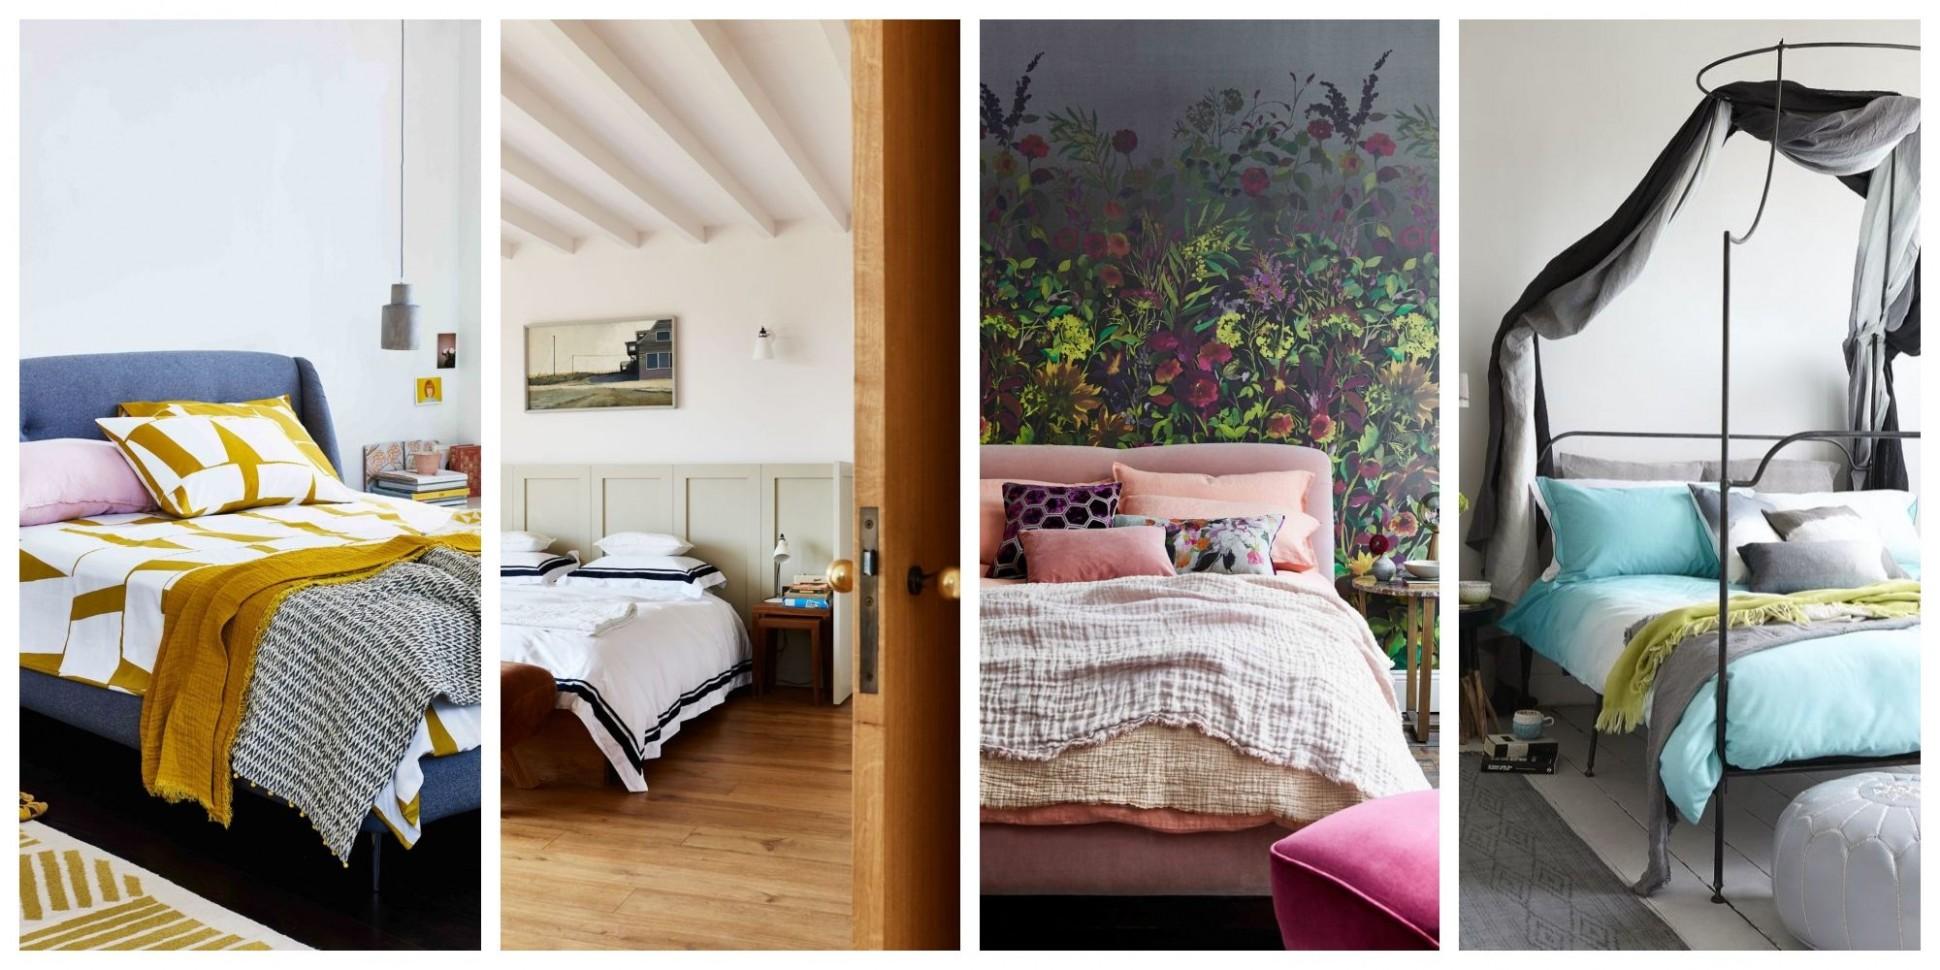 9 Beautiful Bedroom Decorating Ideas - Modern Bedroom Ideas - Bedroom Ideas Uk 2020